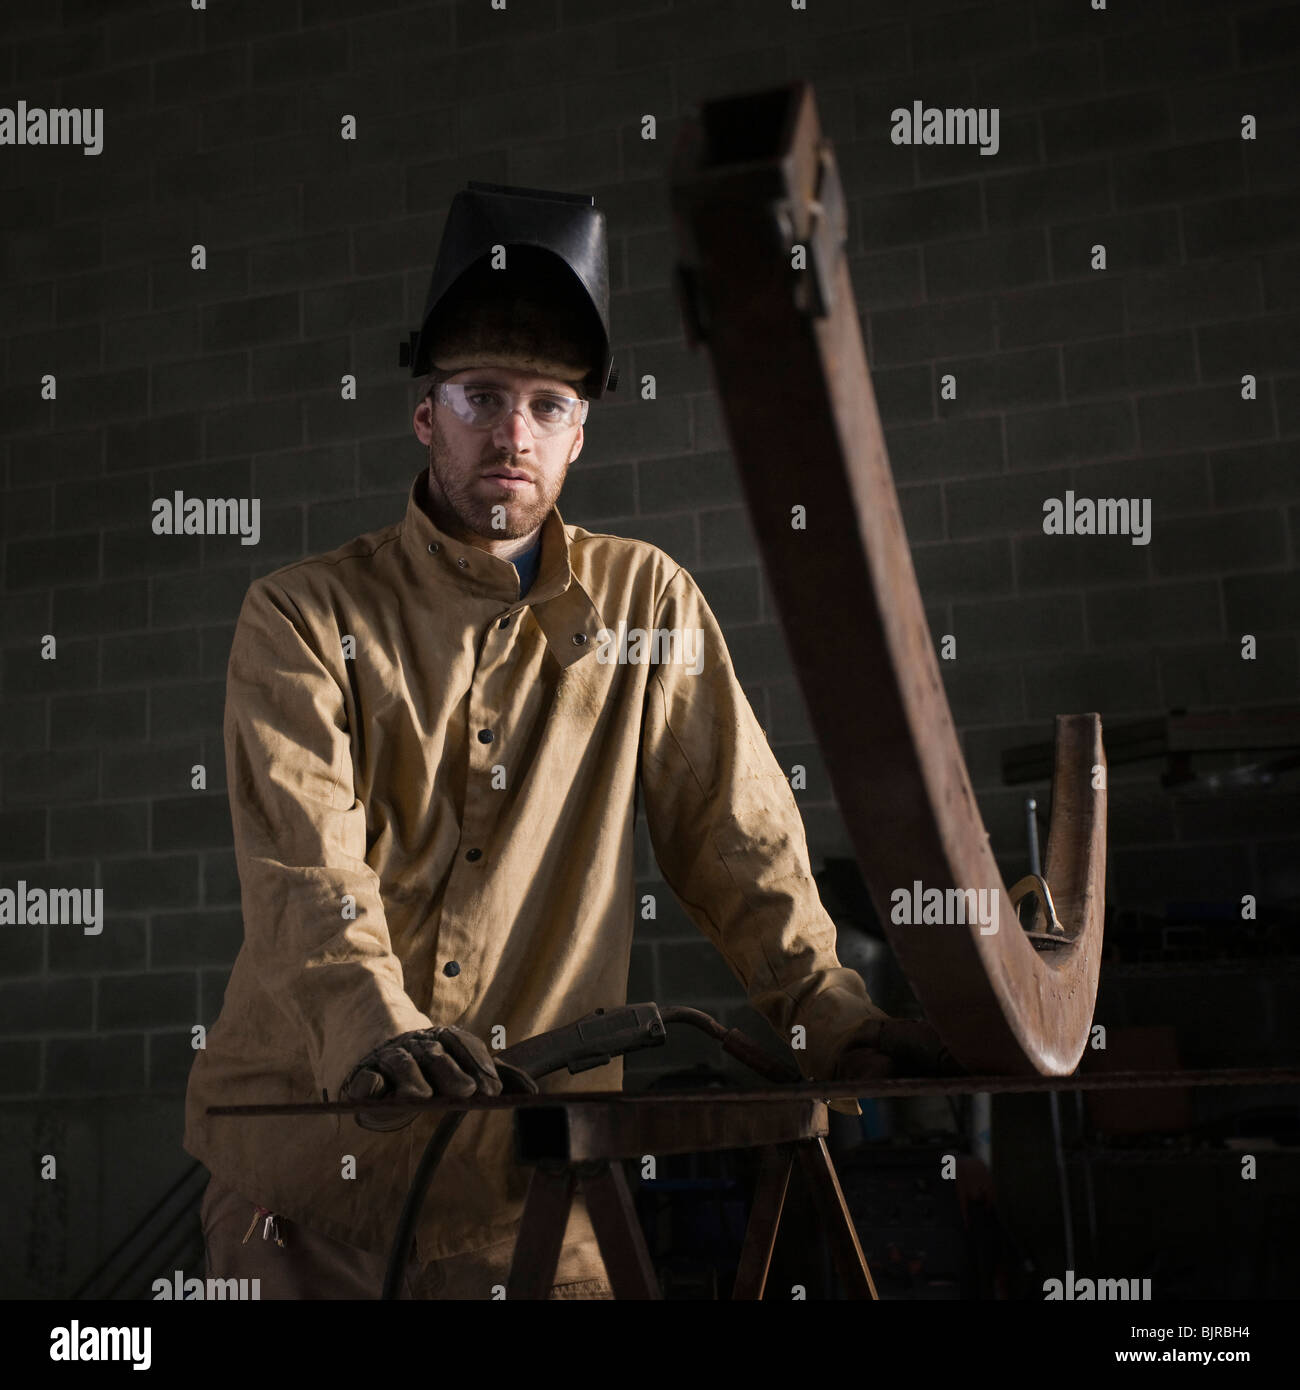 Stati Uniti d'America, Utah, Orem, ritratto del saldatore maschio in officina Immagini Stock